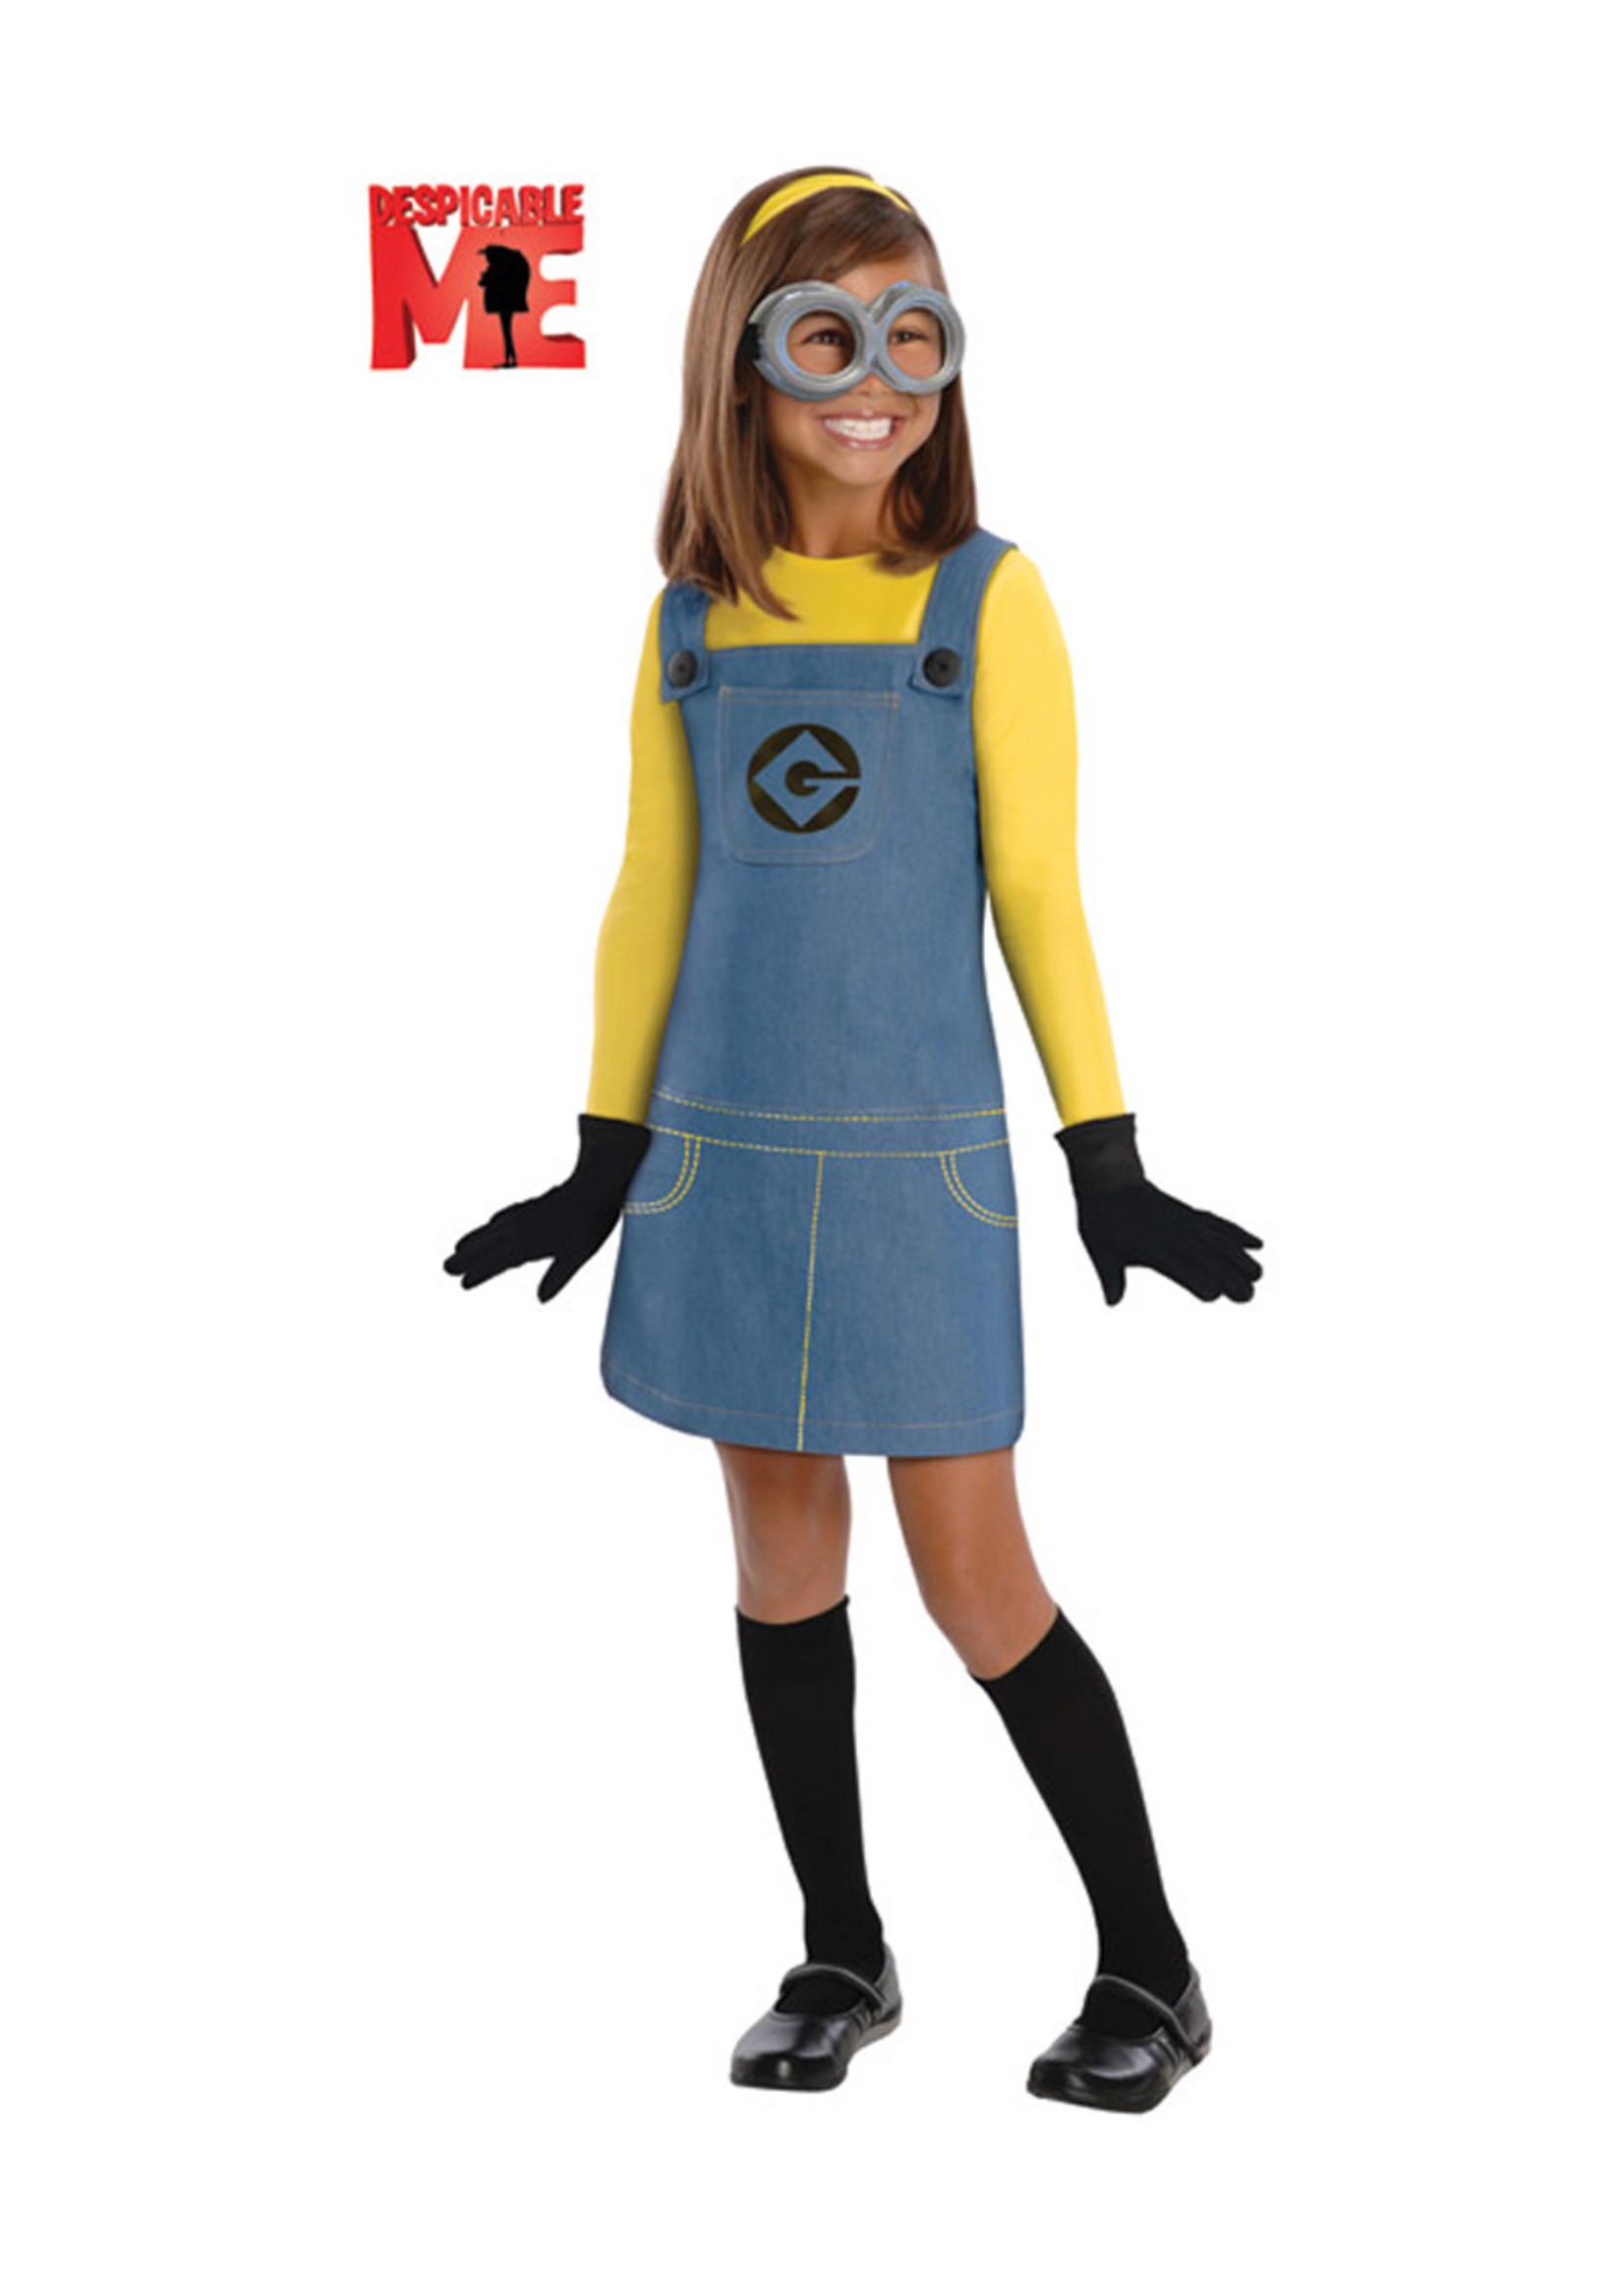 Minion Girl Costume - Girls